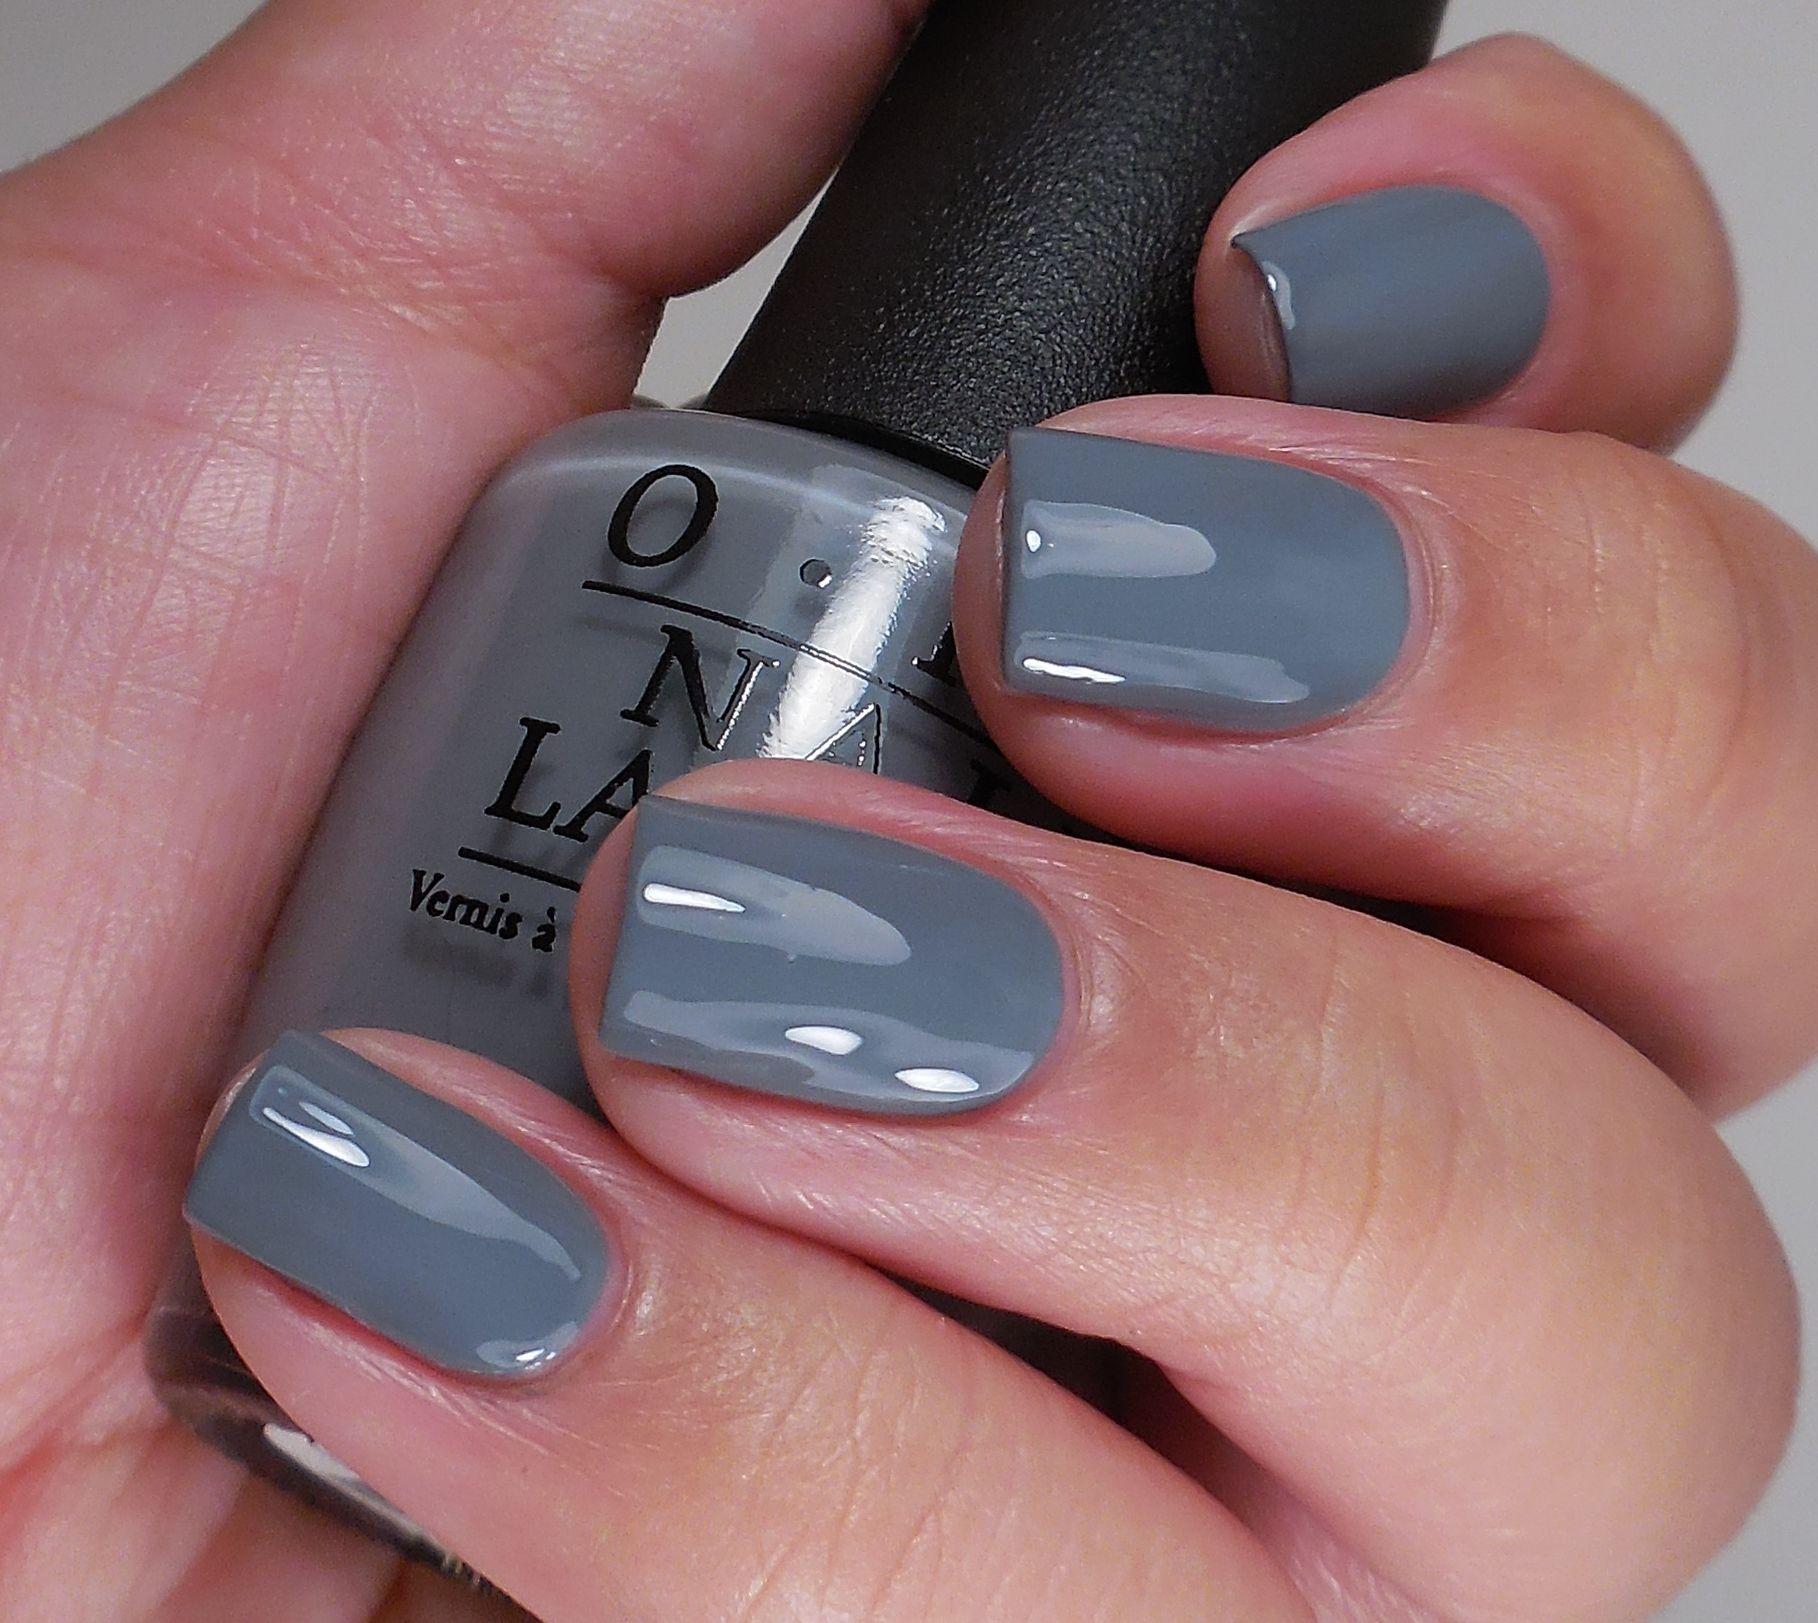 OPI 50 Shades of Grey Collection | 50 shades, OPI and 50th